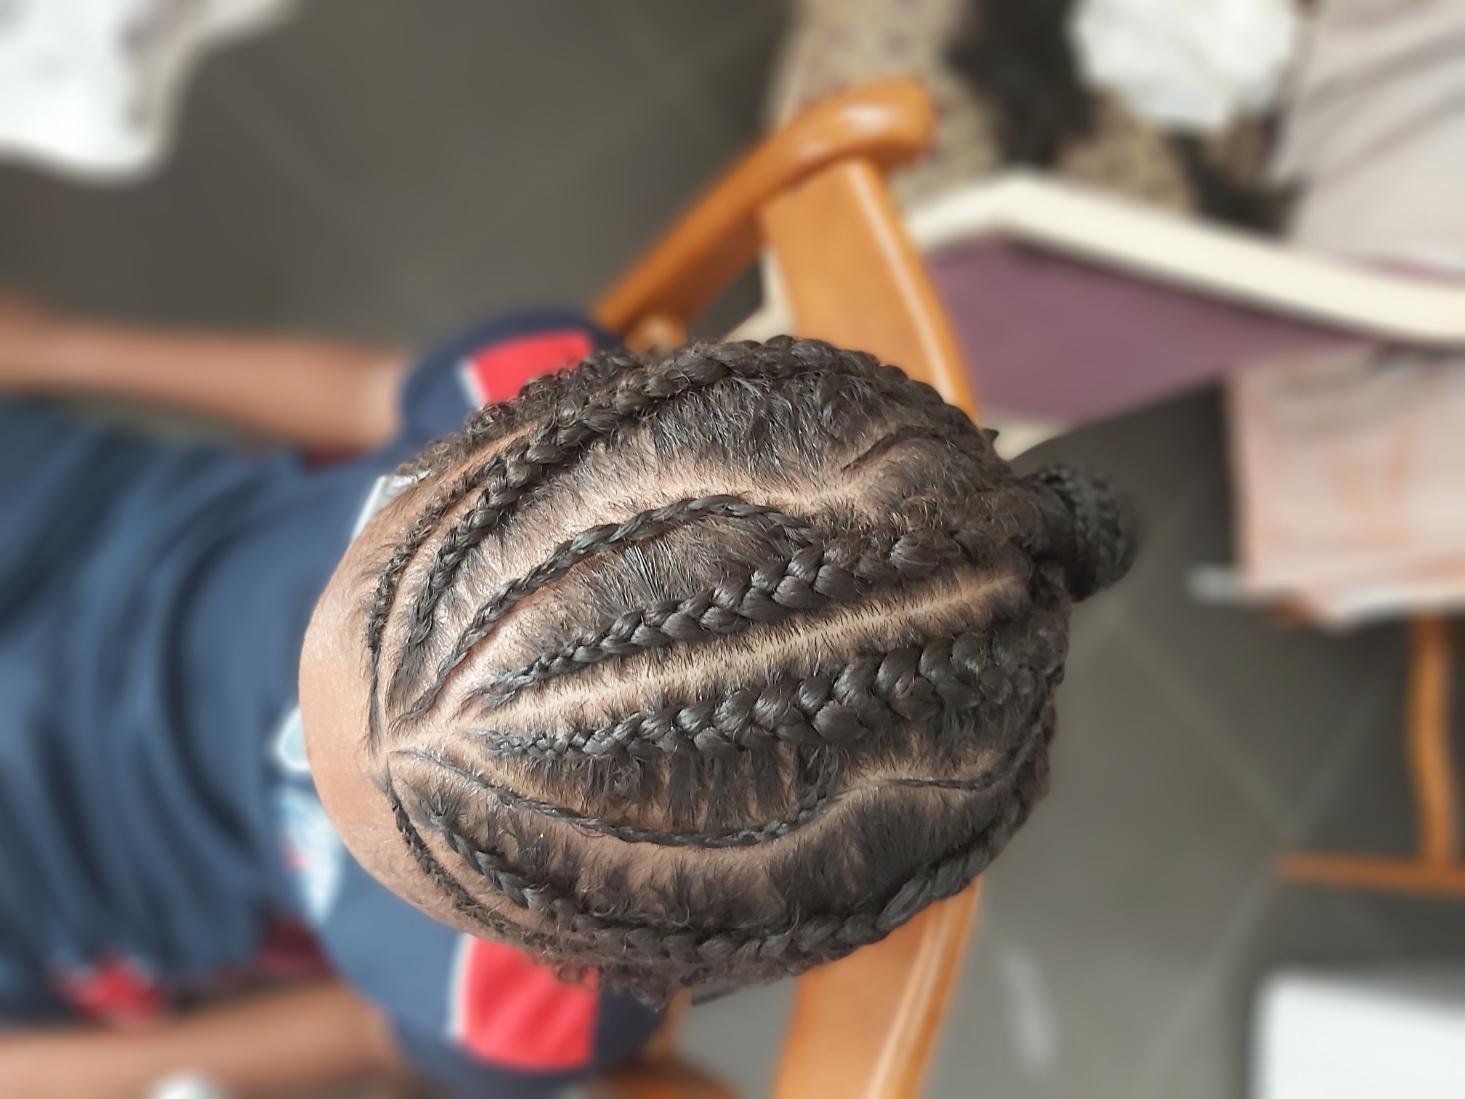 salon de coiffure afro tresse tresses box braids crochet braids vanilles tissages paris 75 77 78 91 92 93 94 95 KQOOOKKA